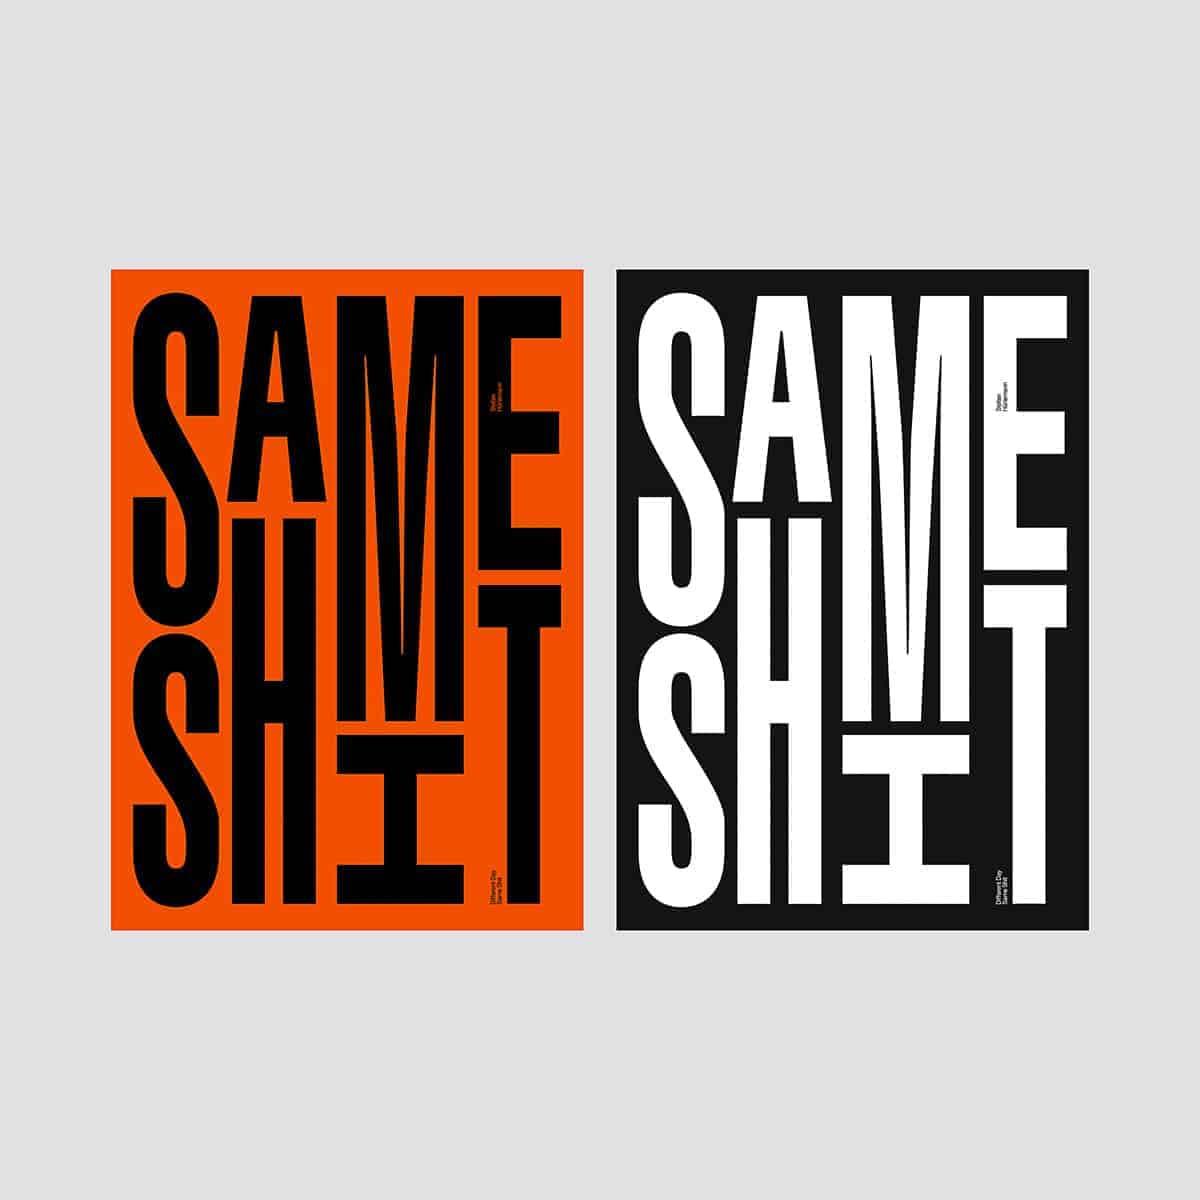 Same shit poster design